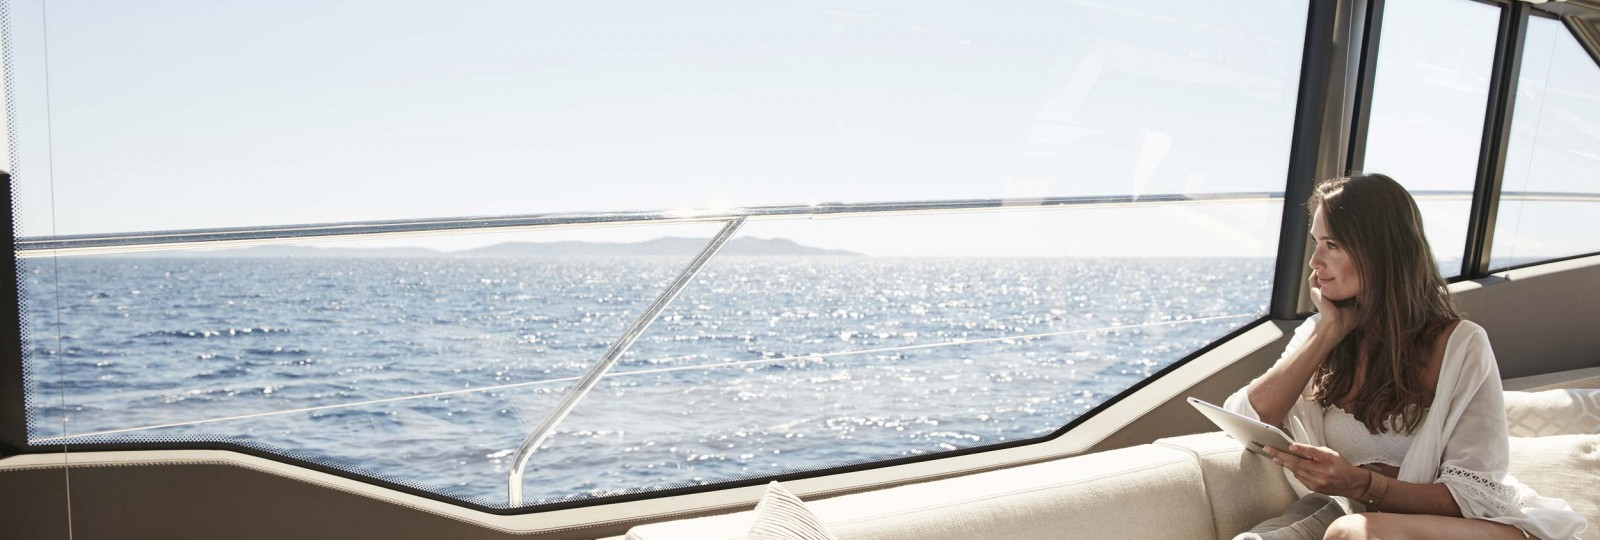 Prestige Yachts 630 saloon